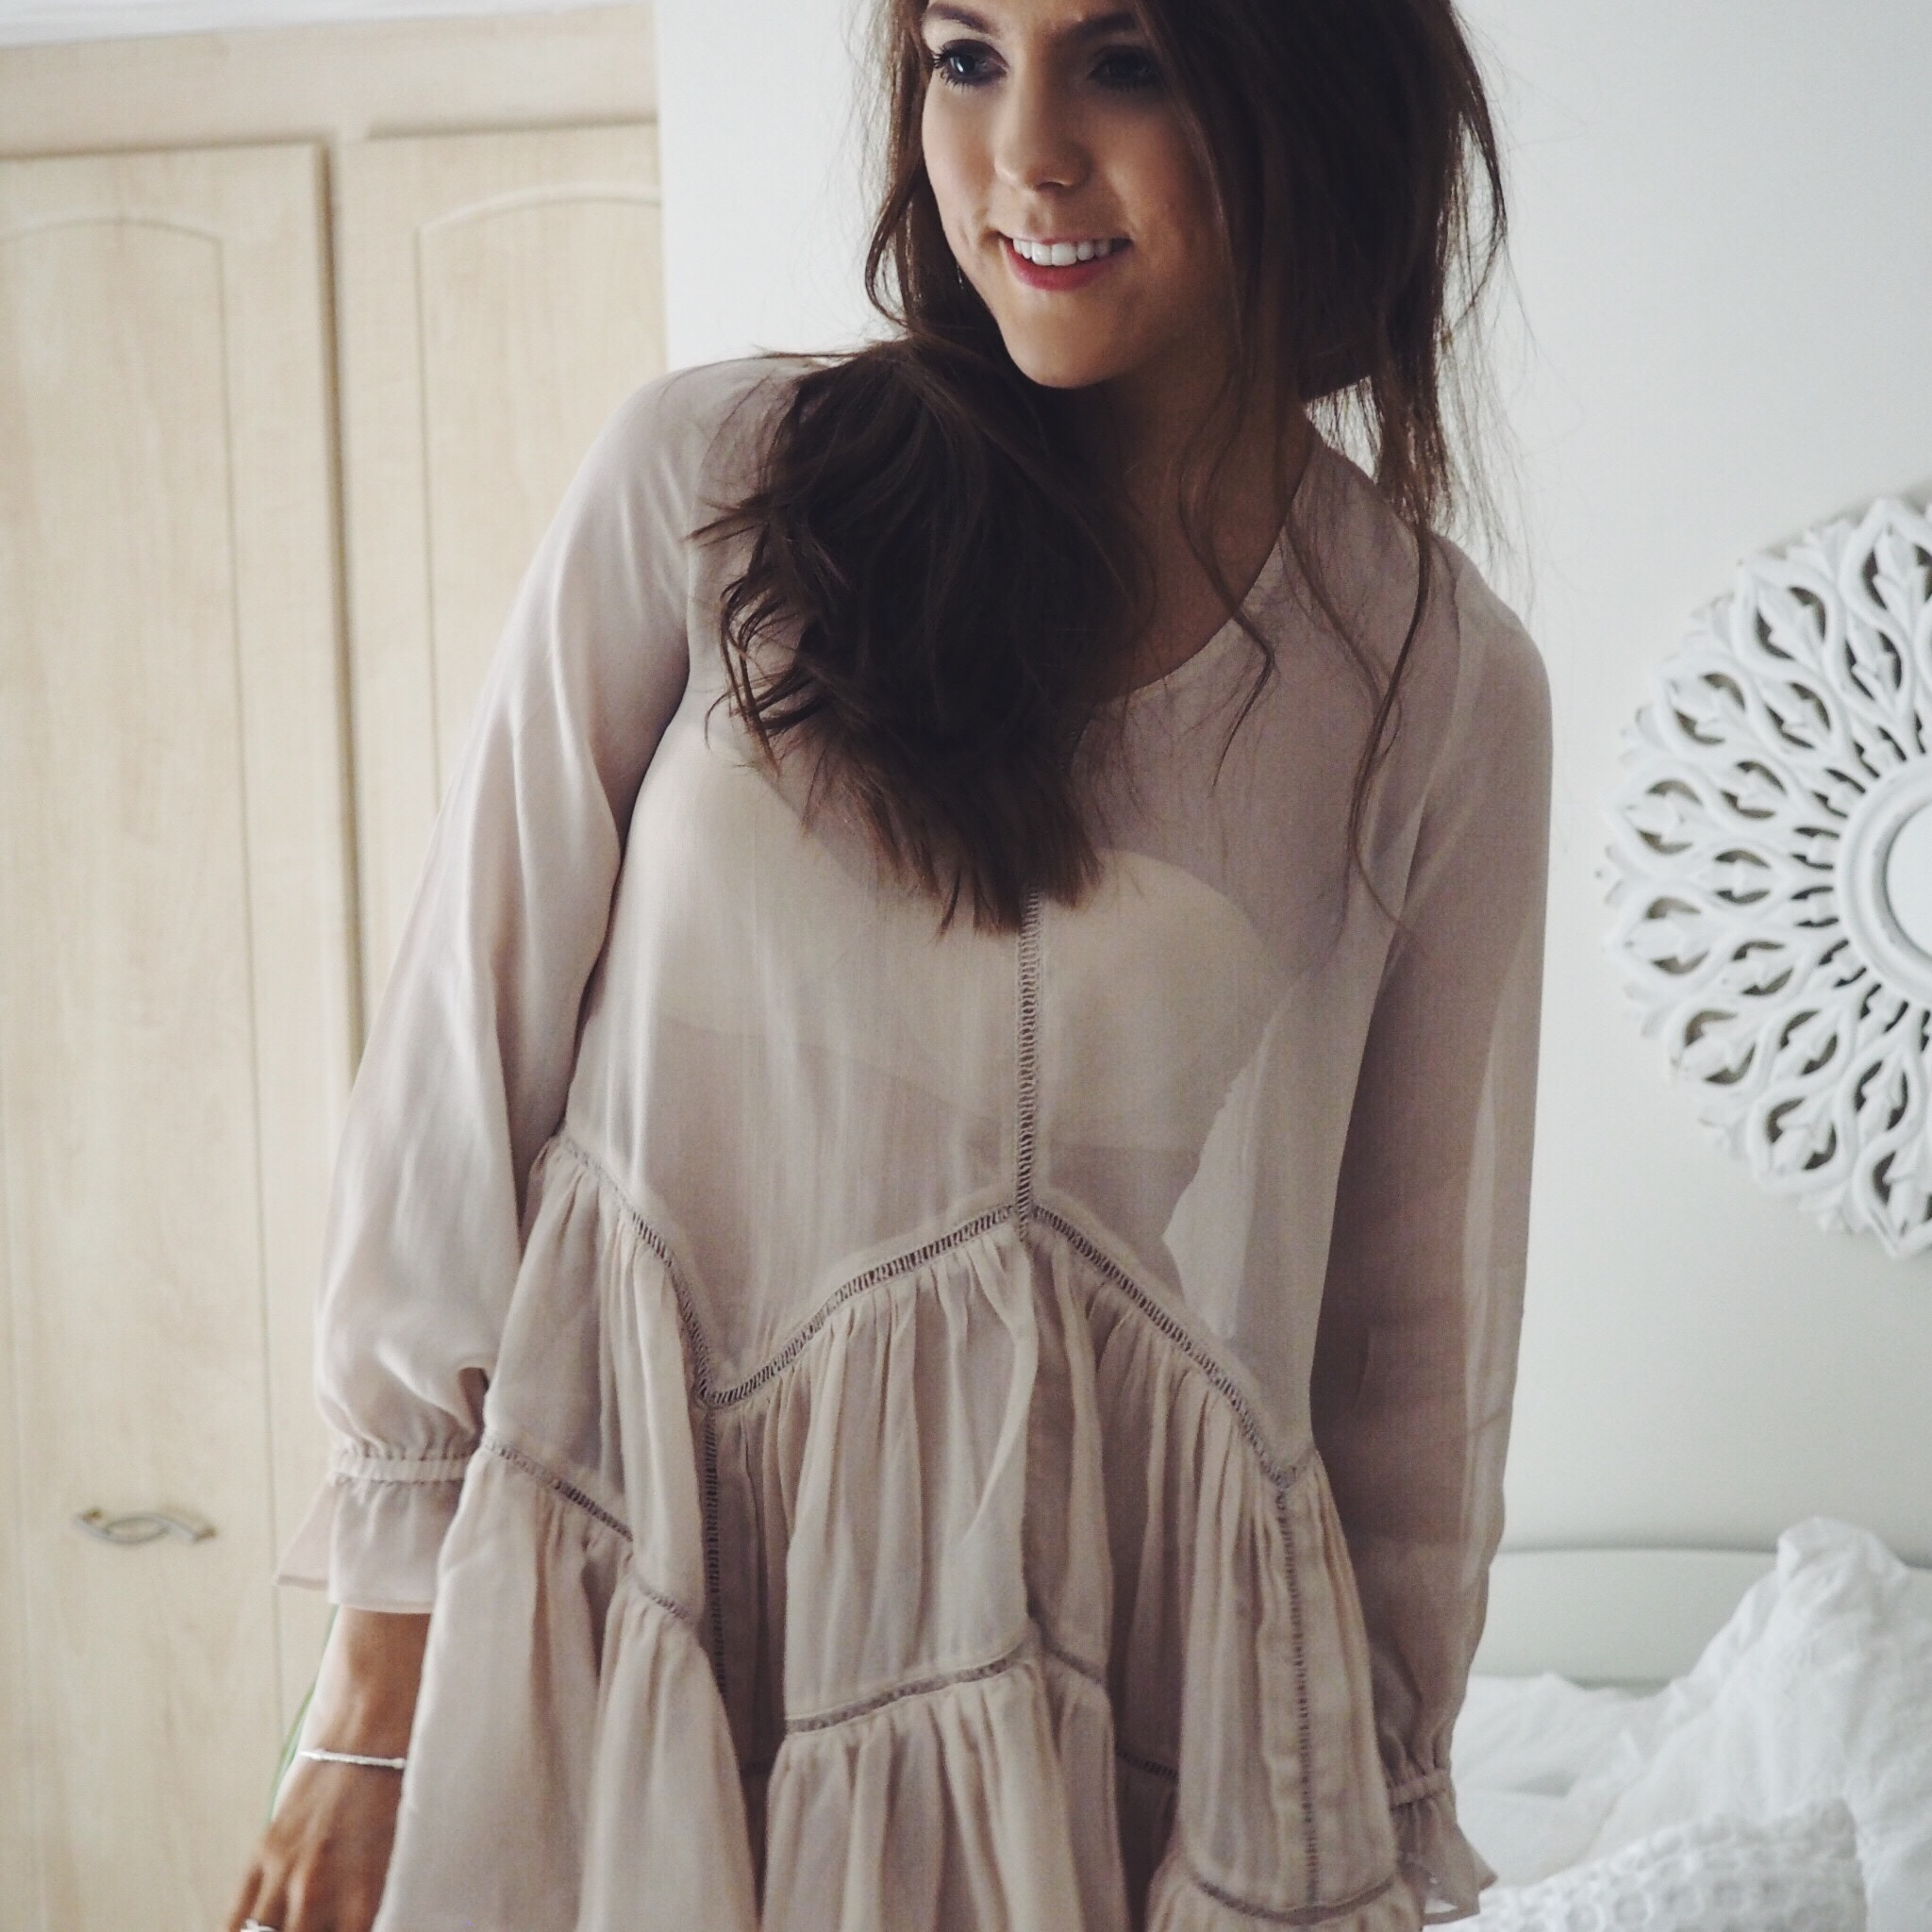 Bohemian vibes. Fashion blogger wearing ruffle hem swing dress